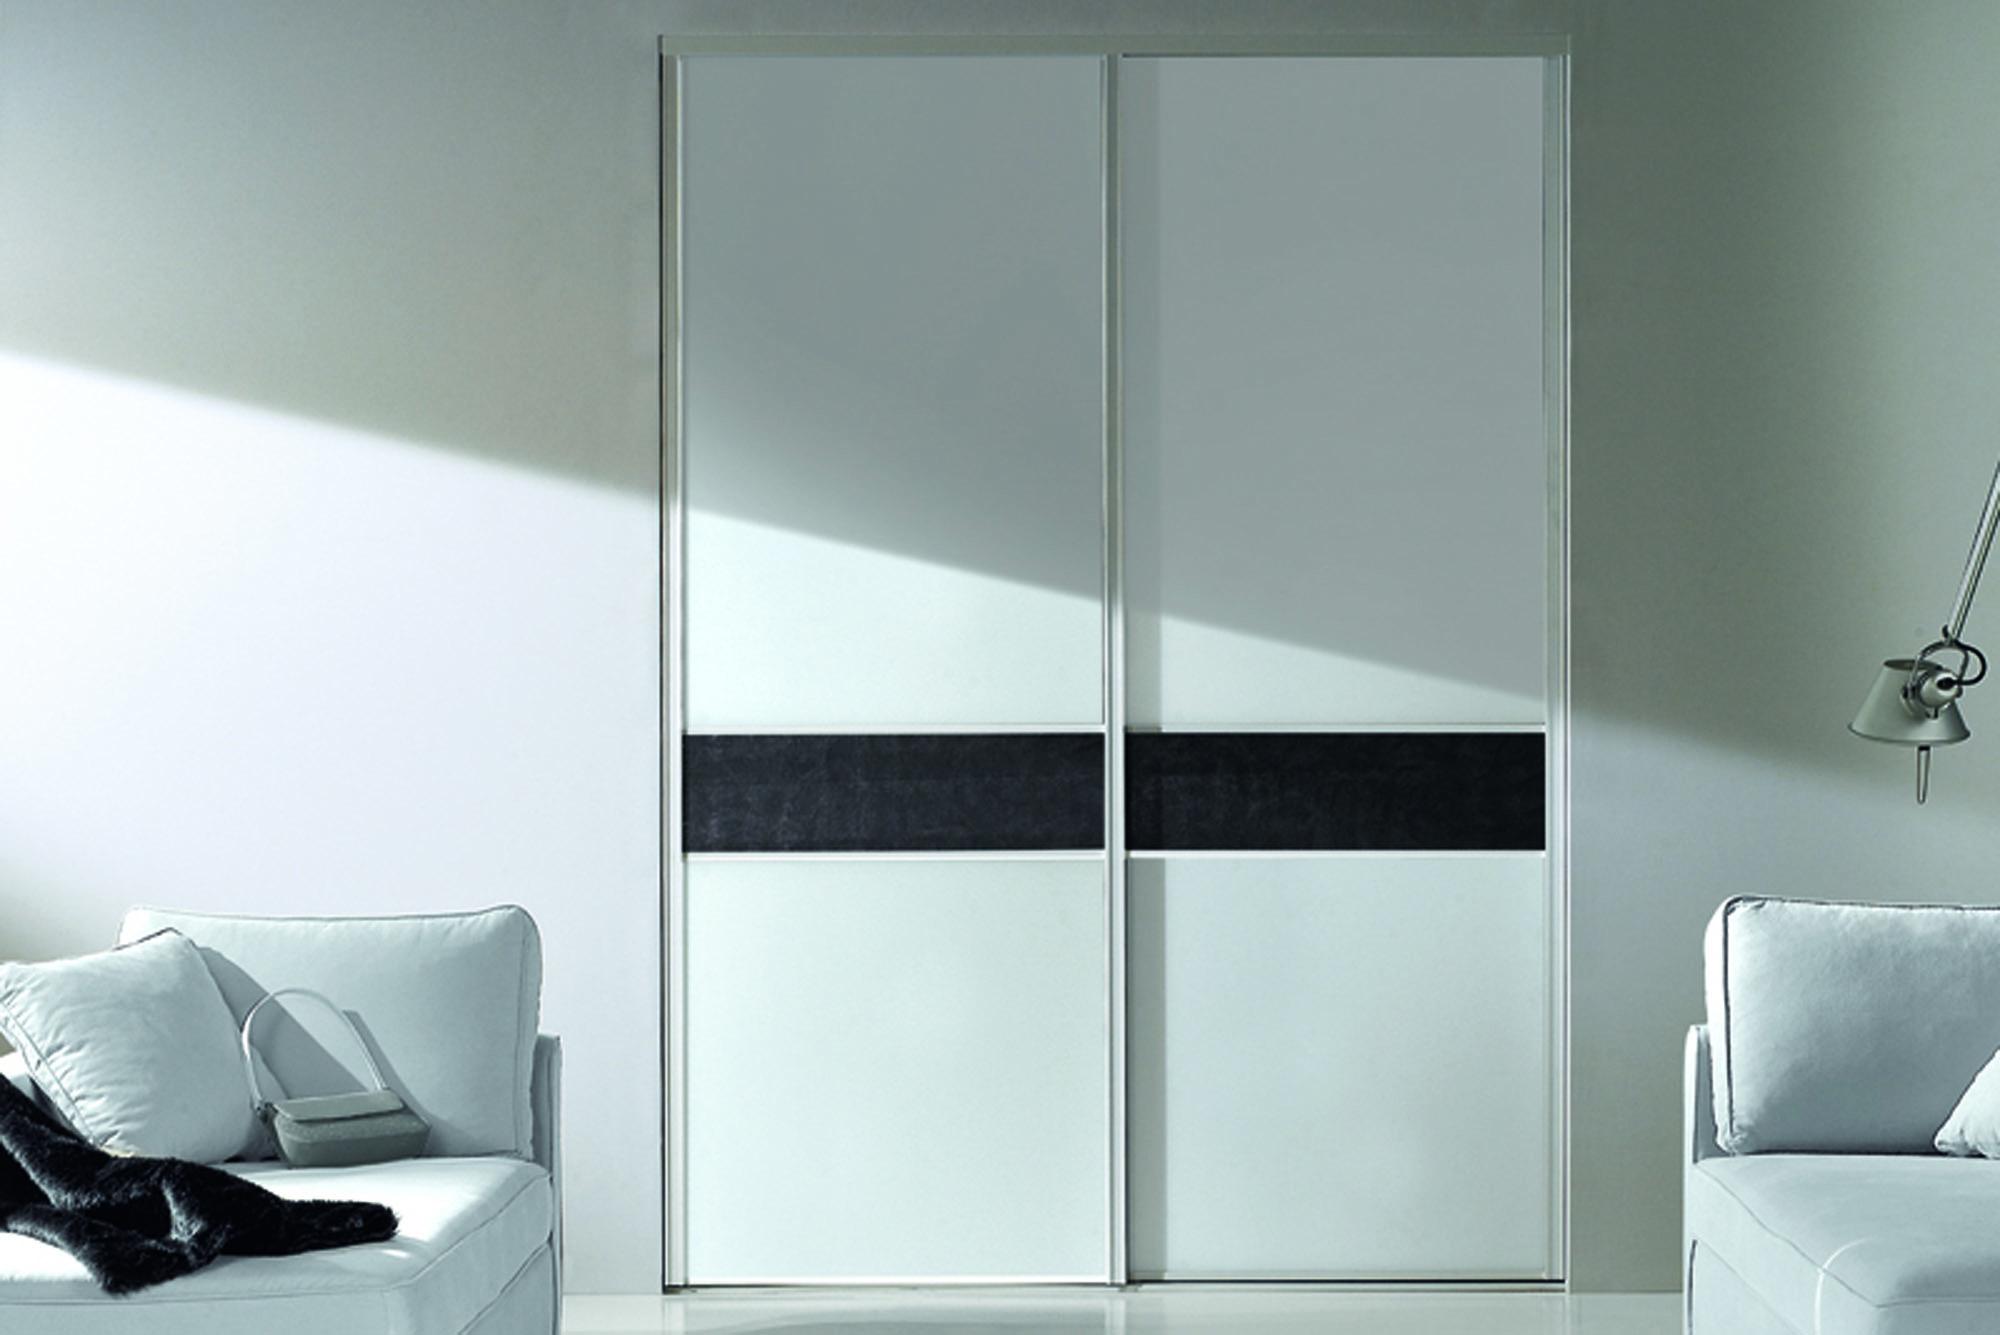 Porte de placard coulidoor blanche et noire